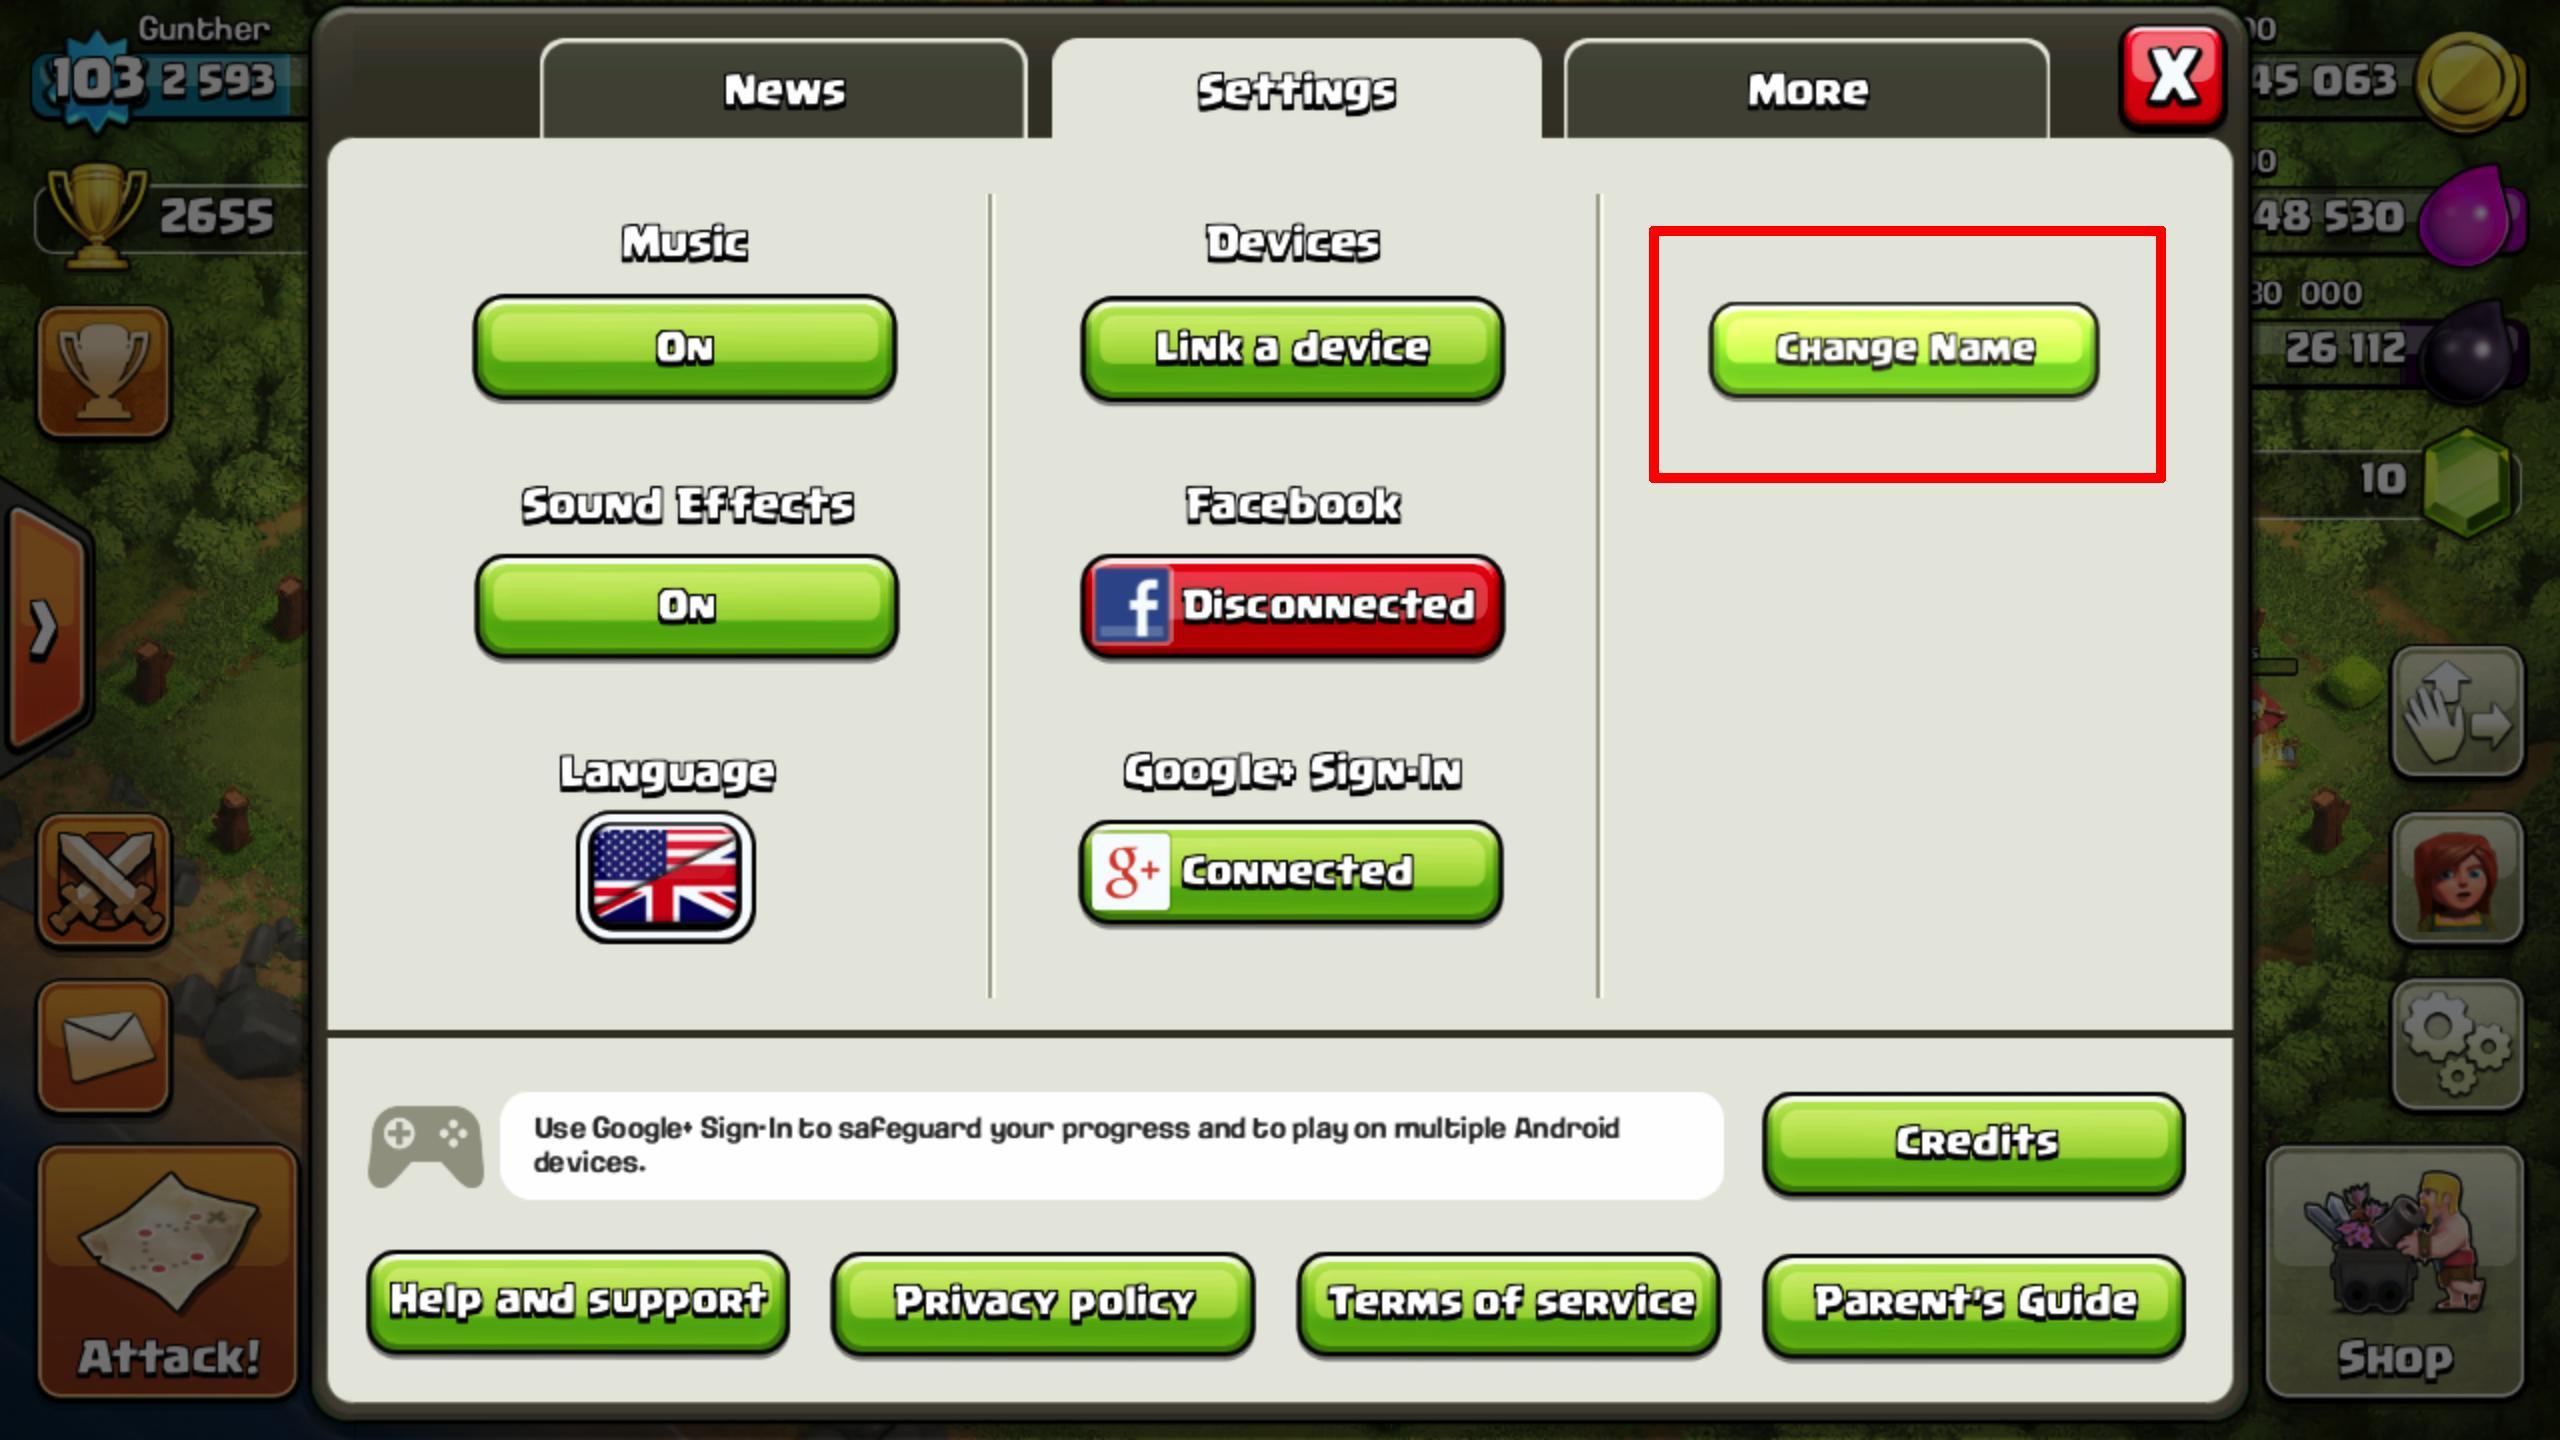 cap-nhat-cac-tinh-nang-moi-cua-clash-of-clans 4